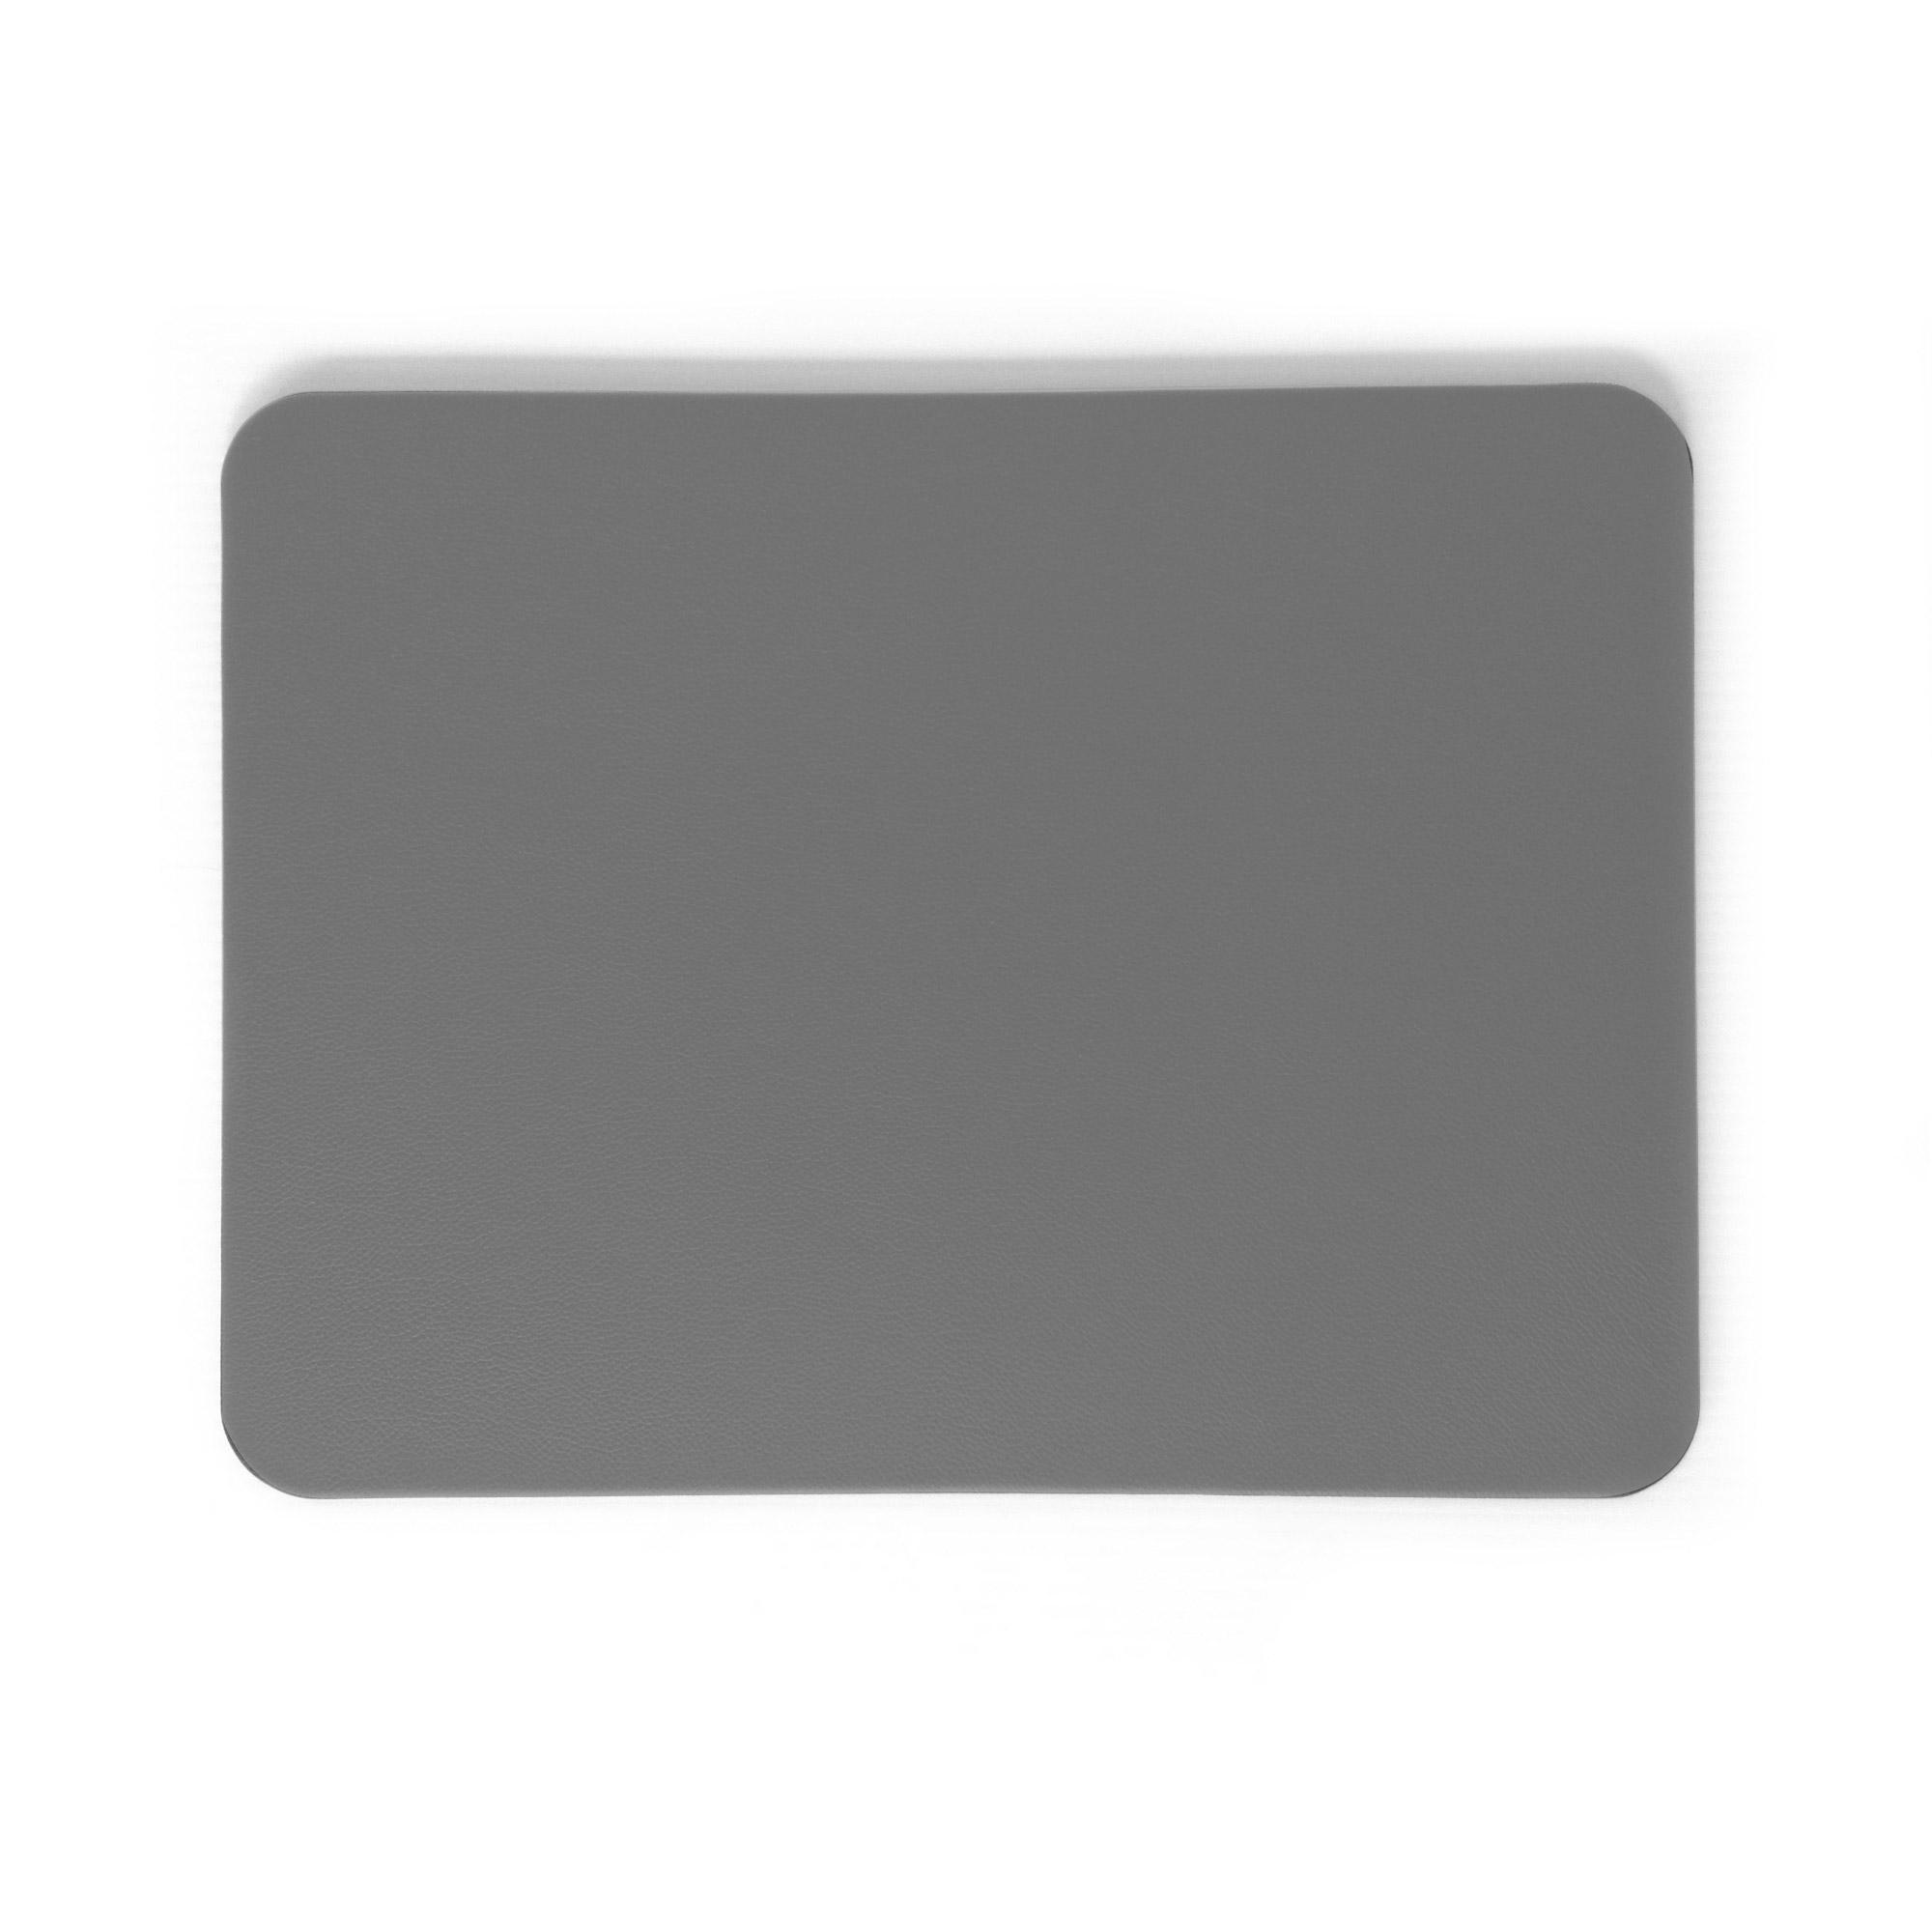 Grey Leather Desk Blotter Pad Prestige Office Accessories